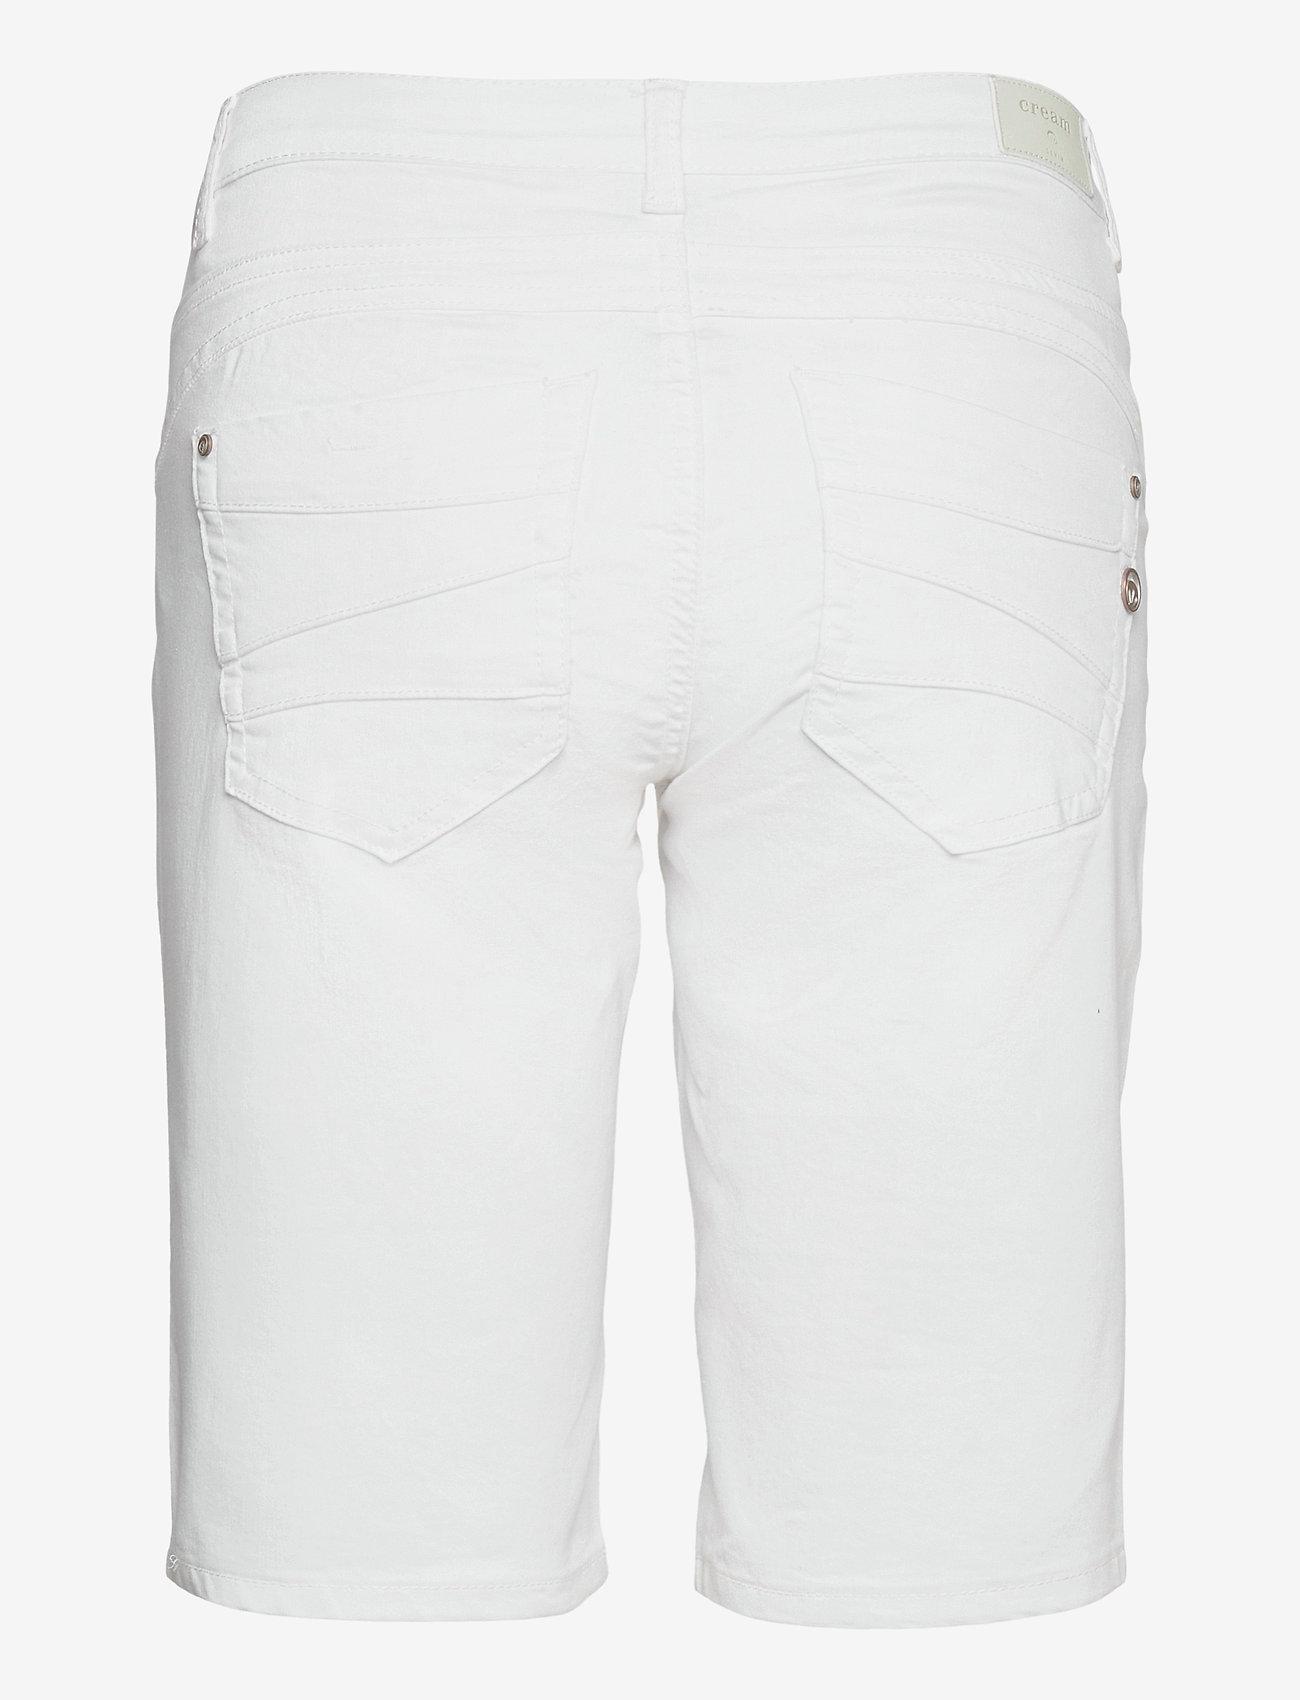 Cream - VavaCR Shorts - Coco Fit - bermudas - snow white - 1